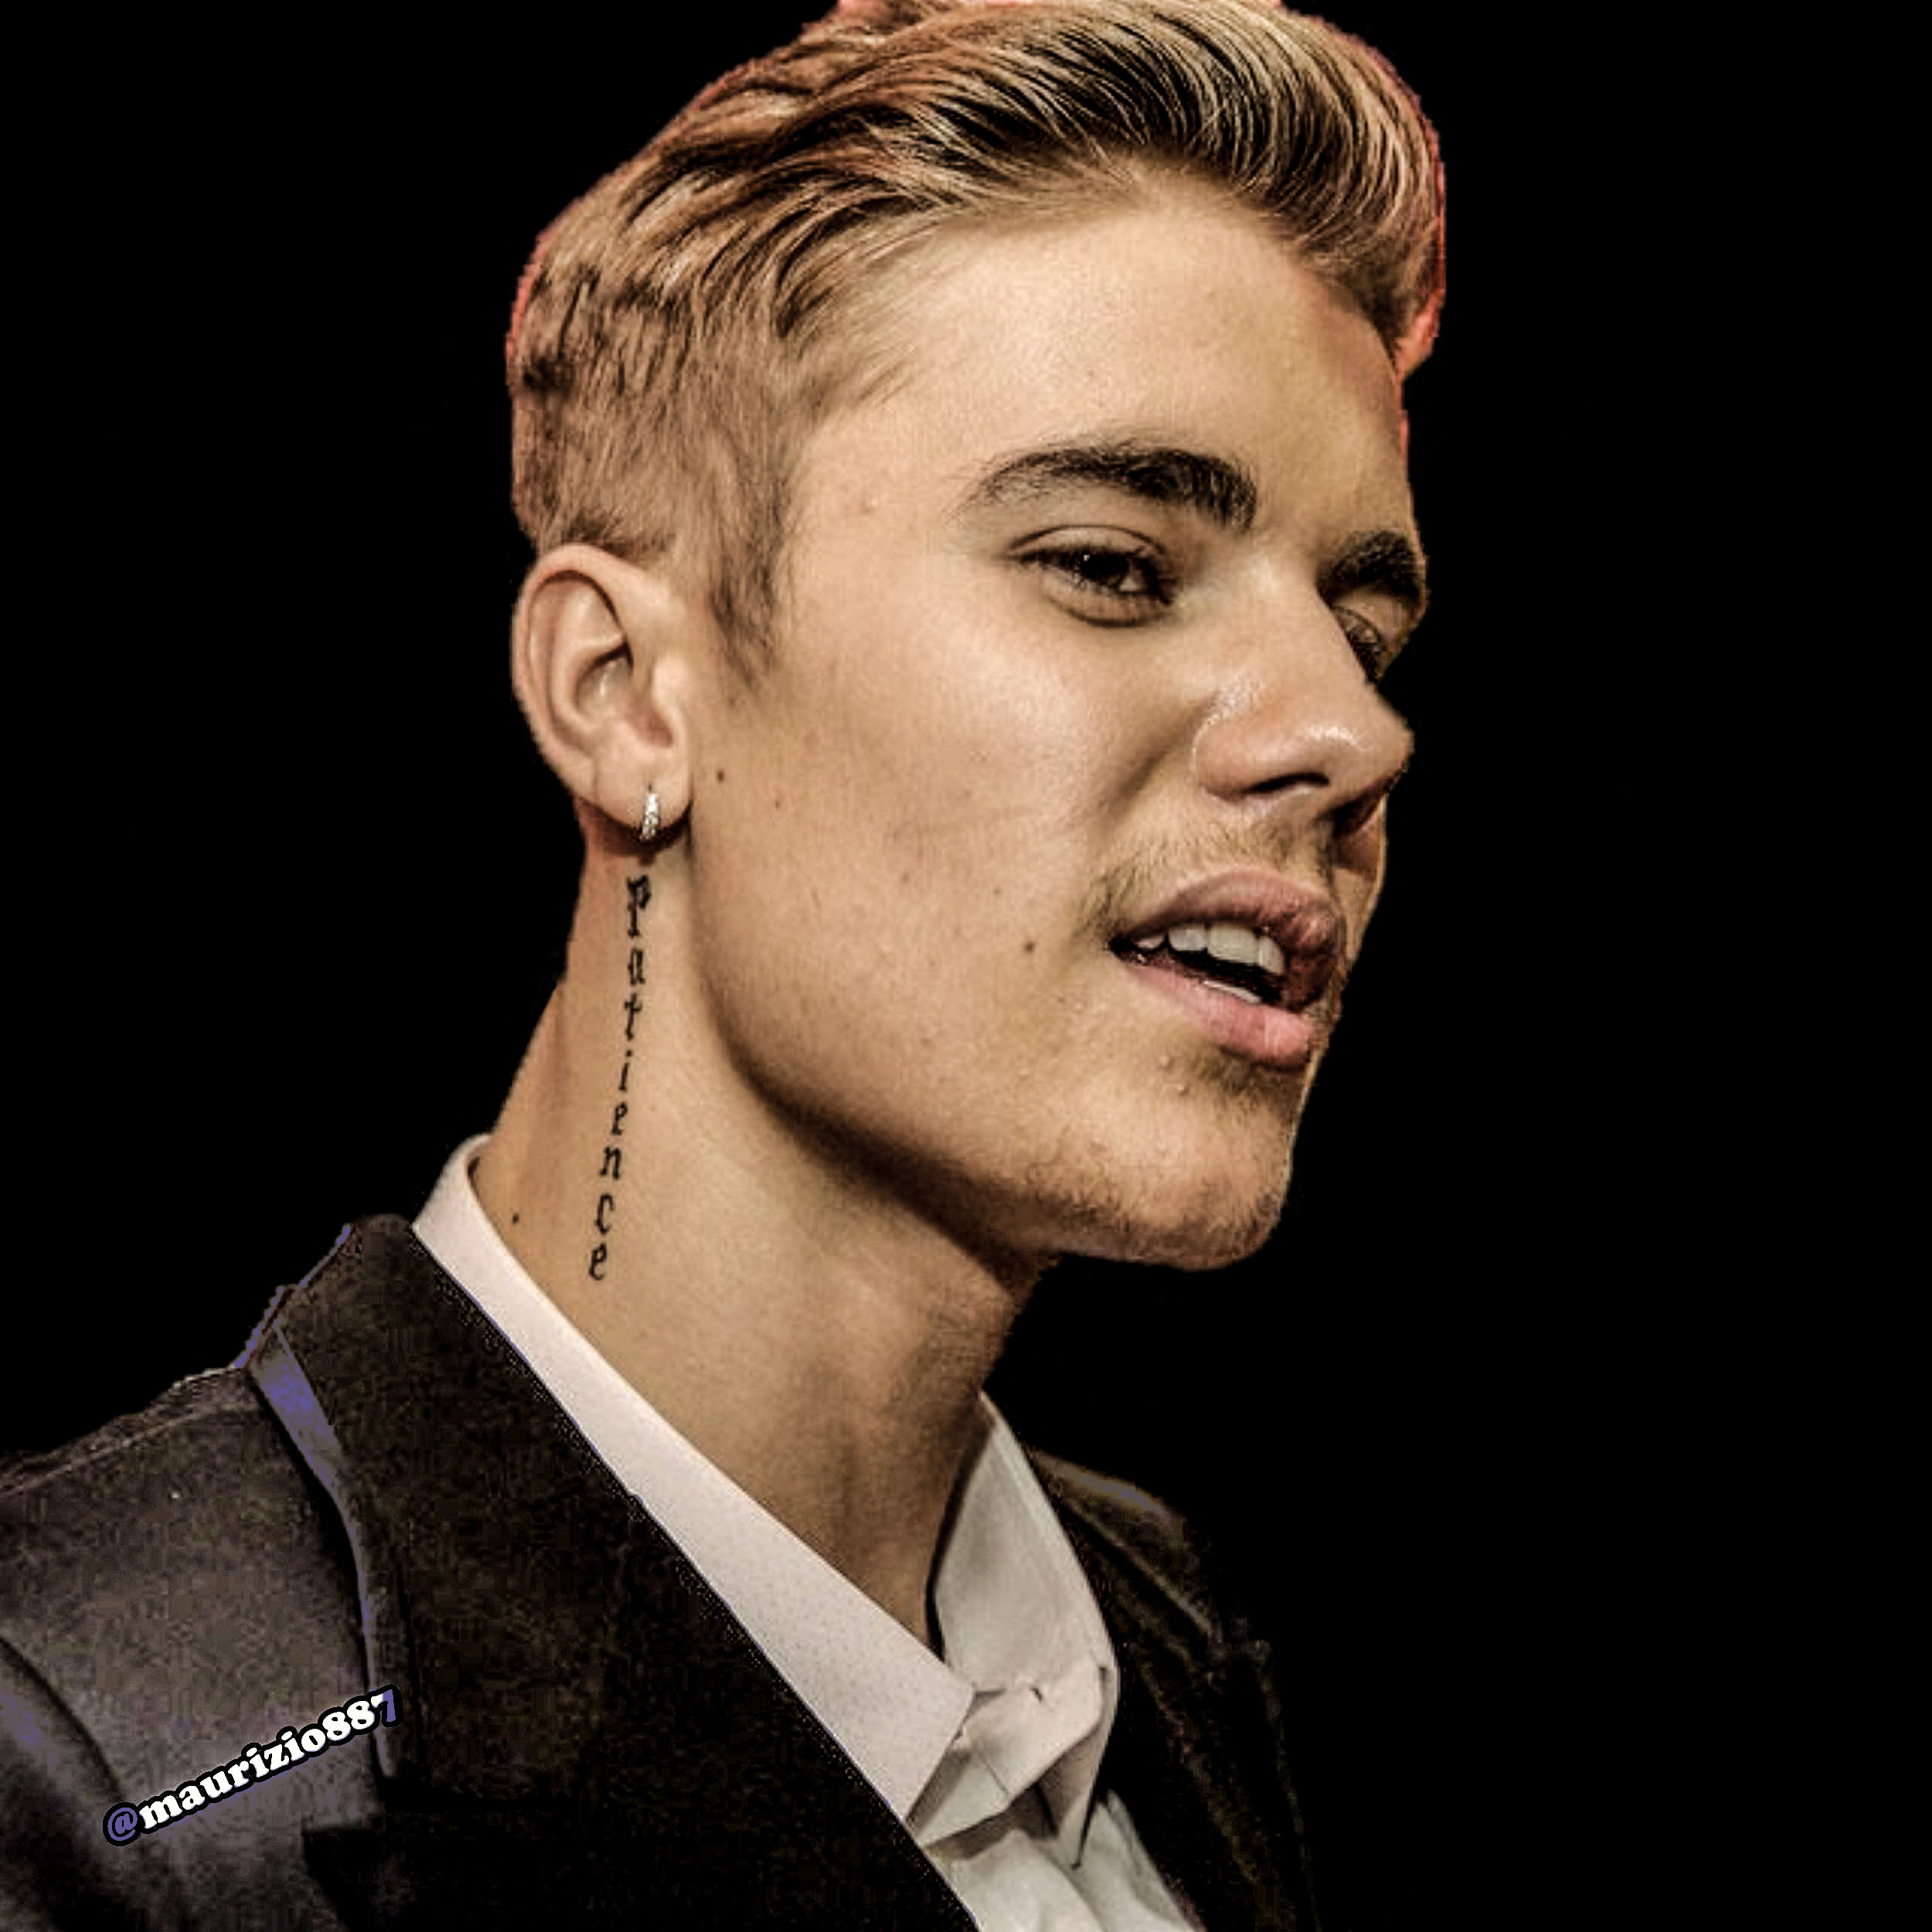 Justin Bieber Images AmfAR 2014 HD Wallpaper And Background Photos